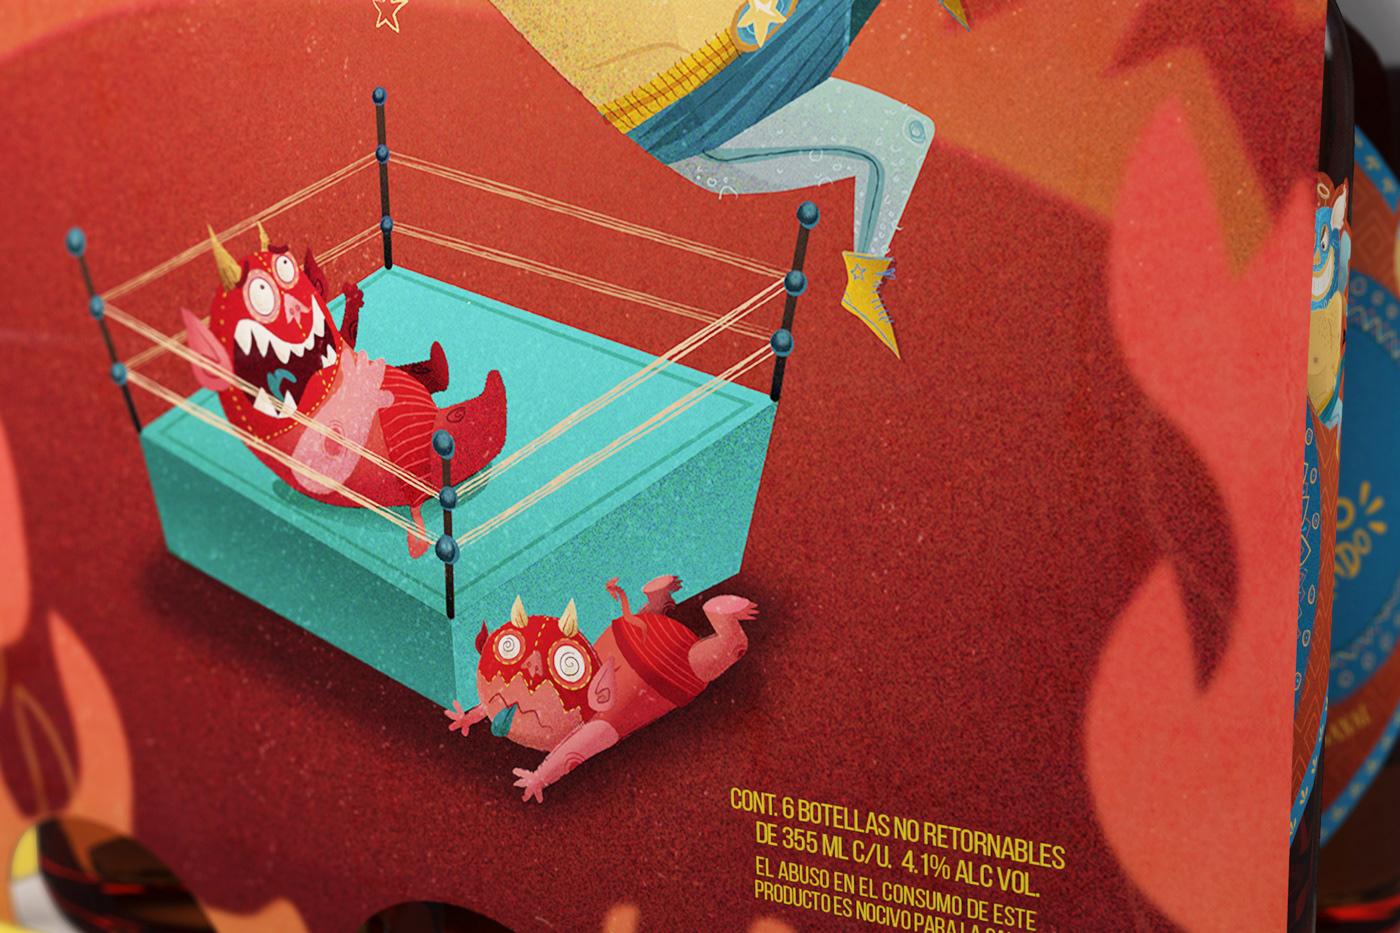 branding  Character design  Mexican Wrestling ILLUSTRATION  beer lucha libre lettering artesanal Packaging